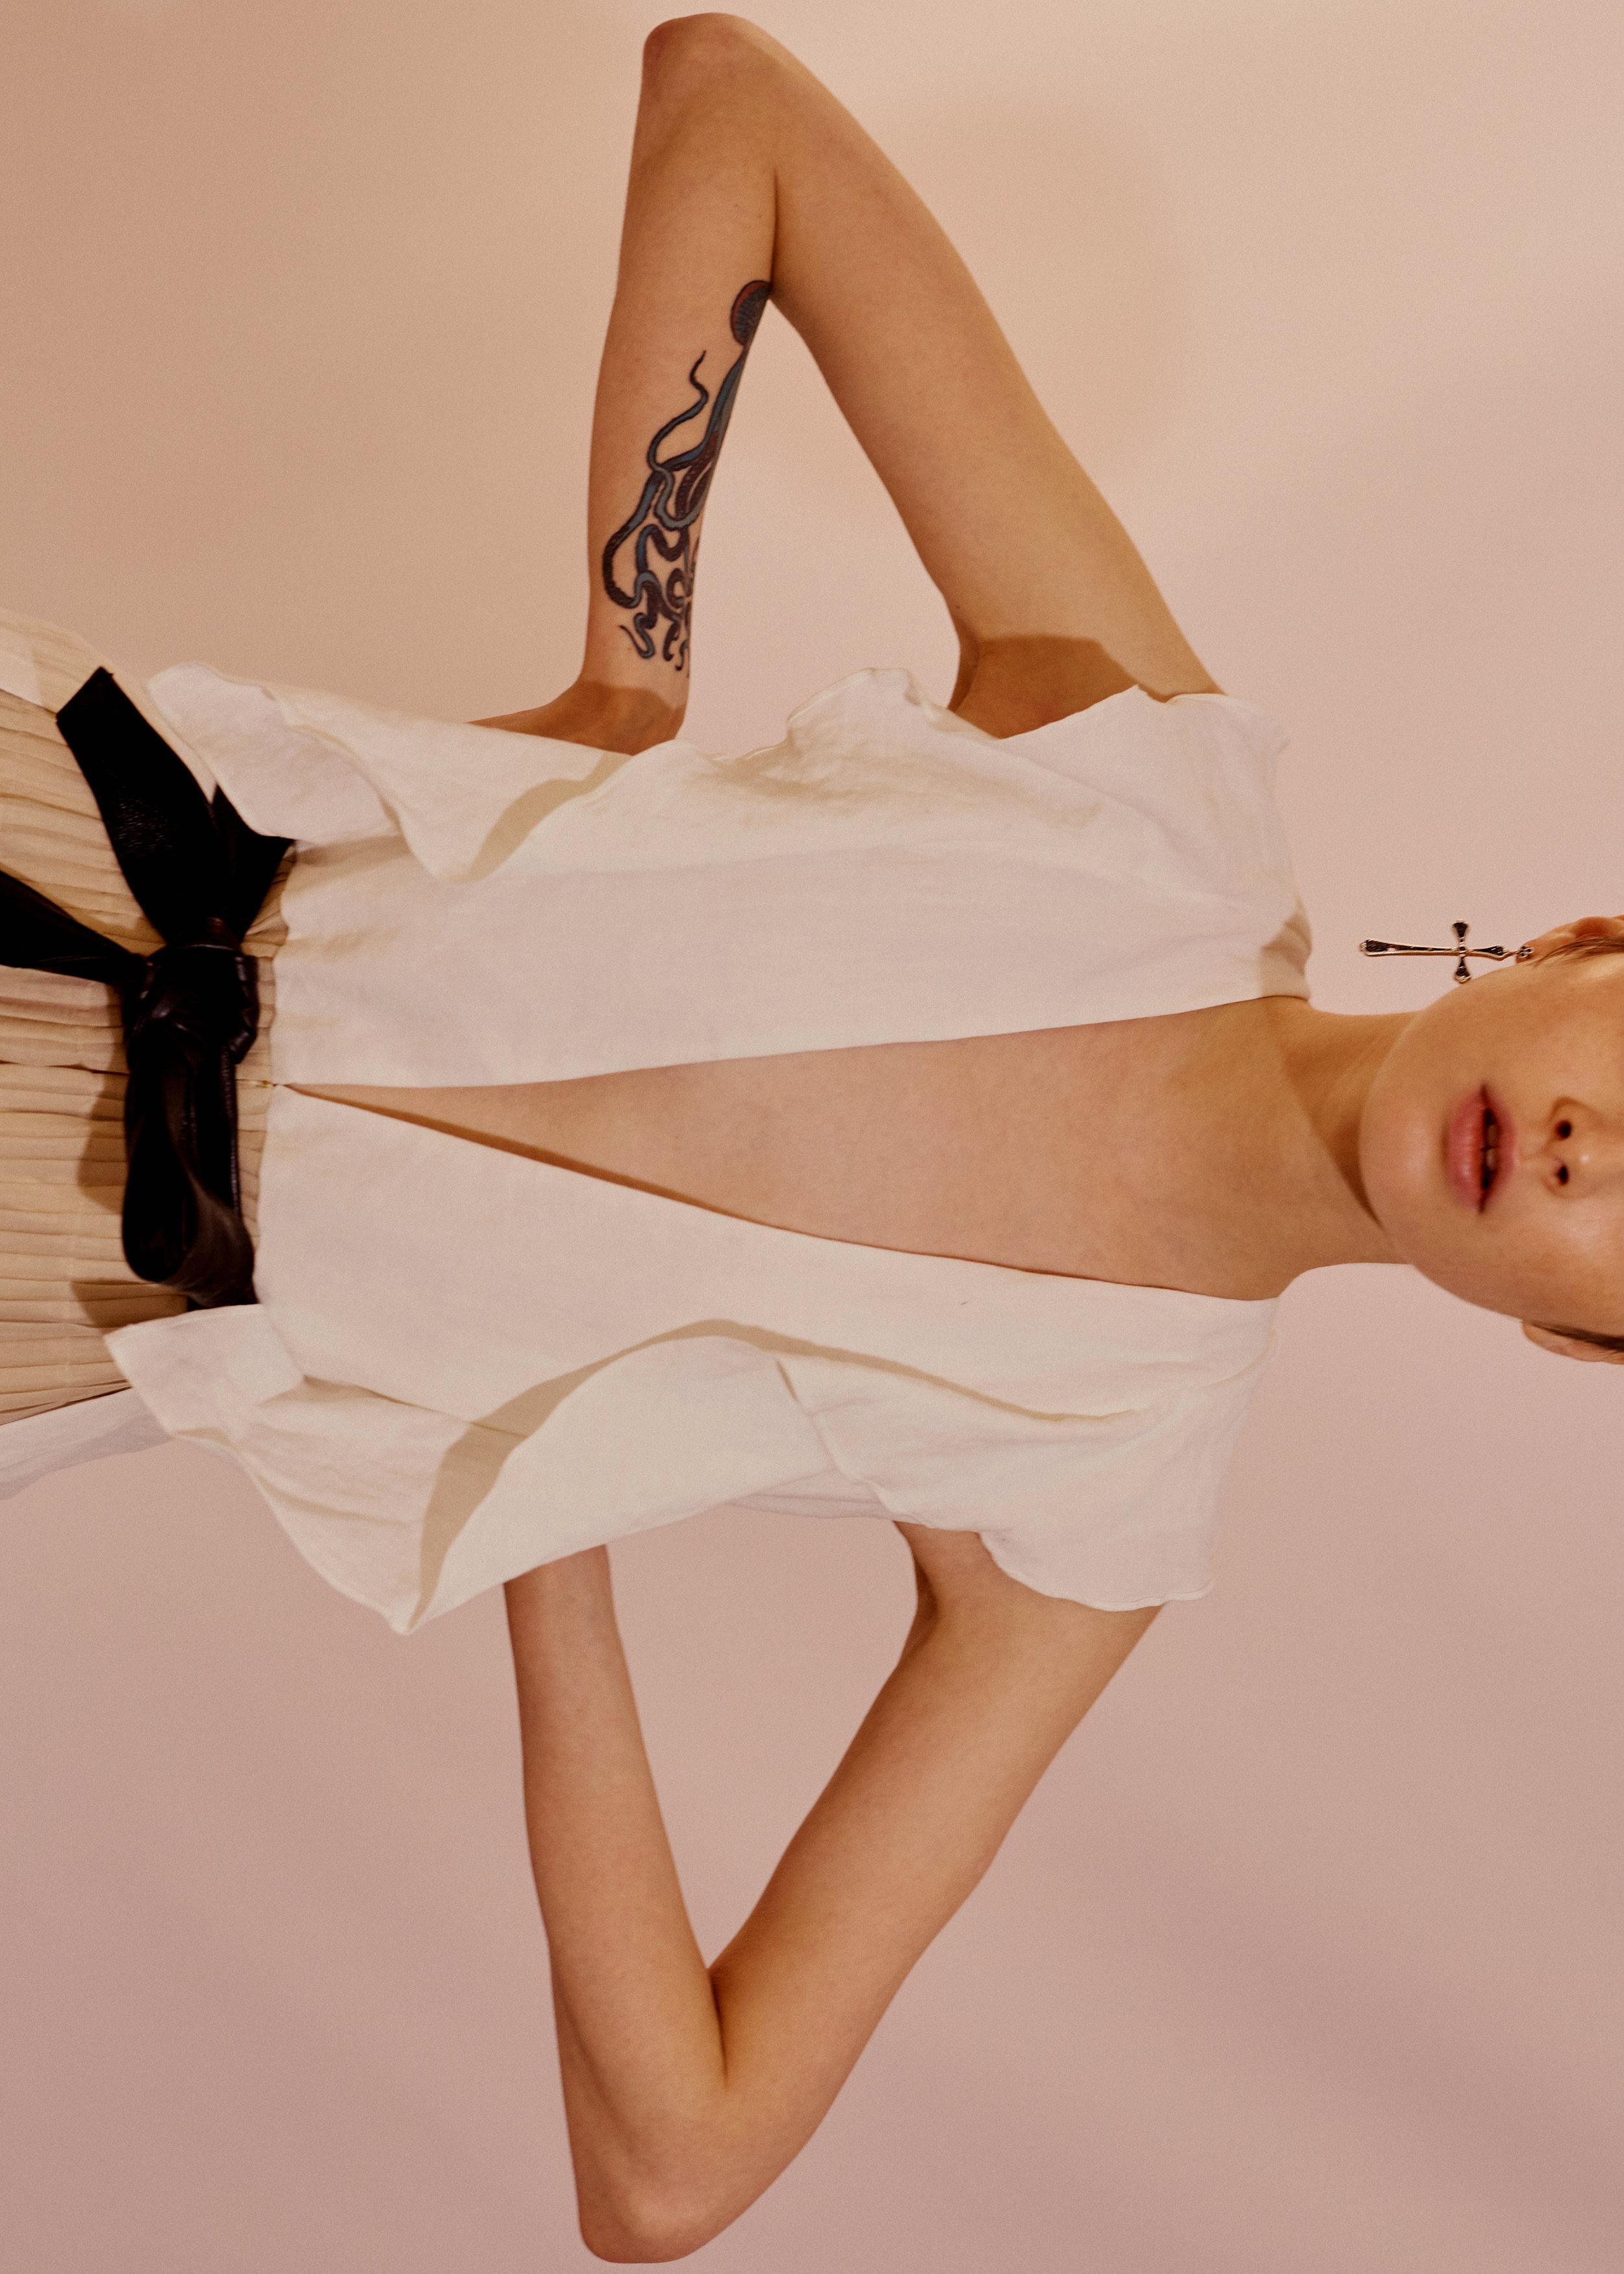 Dress MARNI Belt Stylist´s Own Earring THOMAS SABO